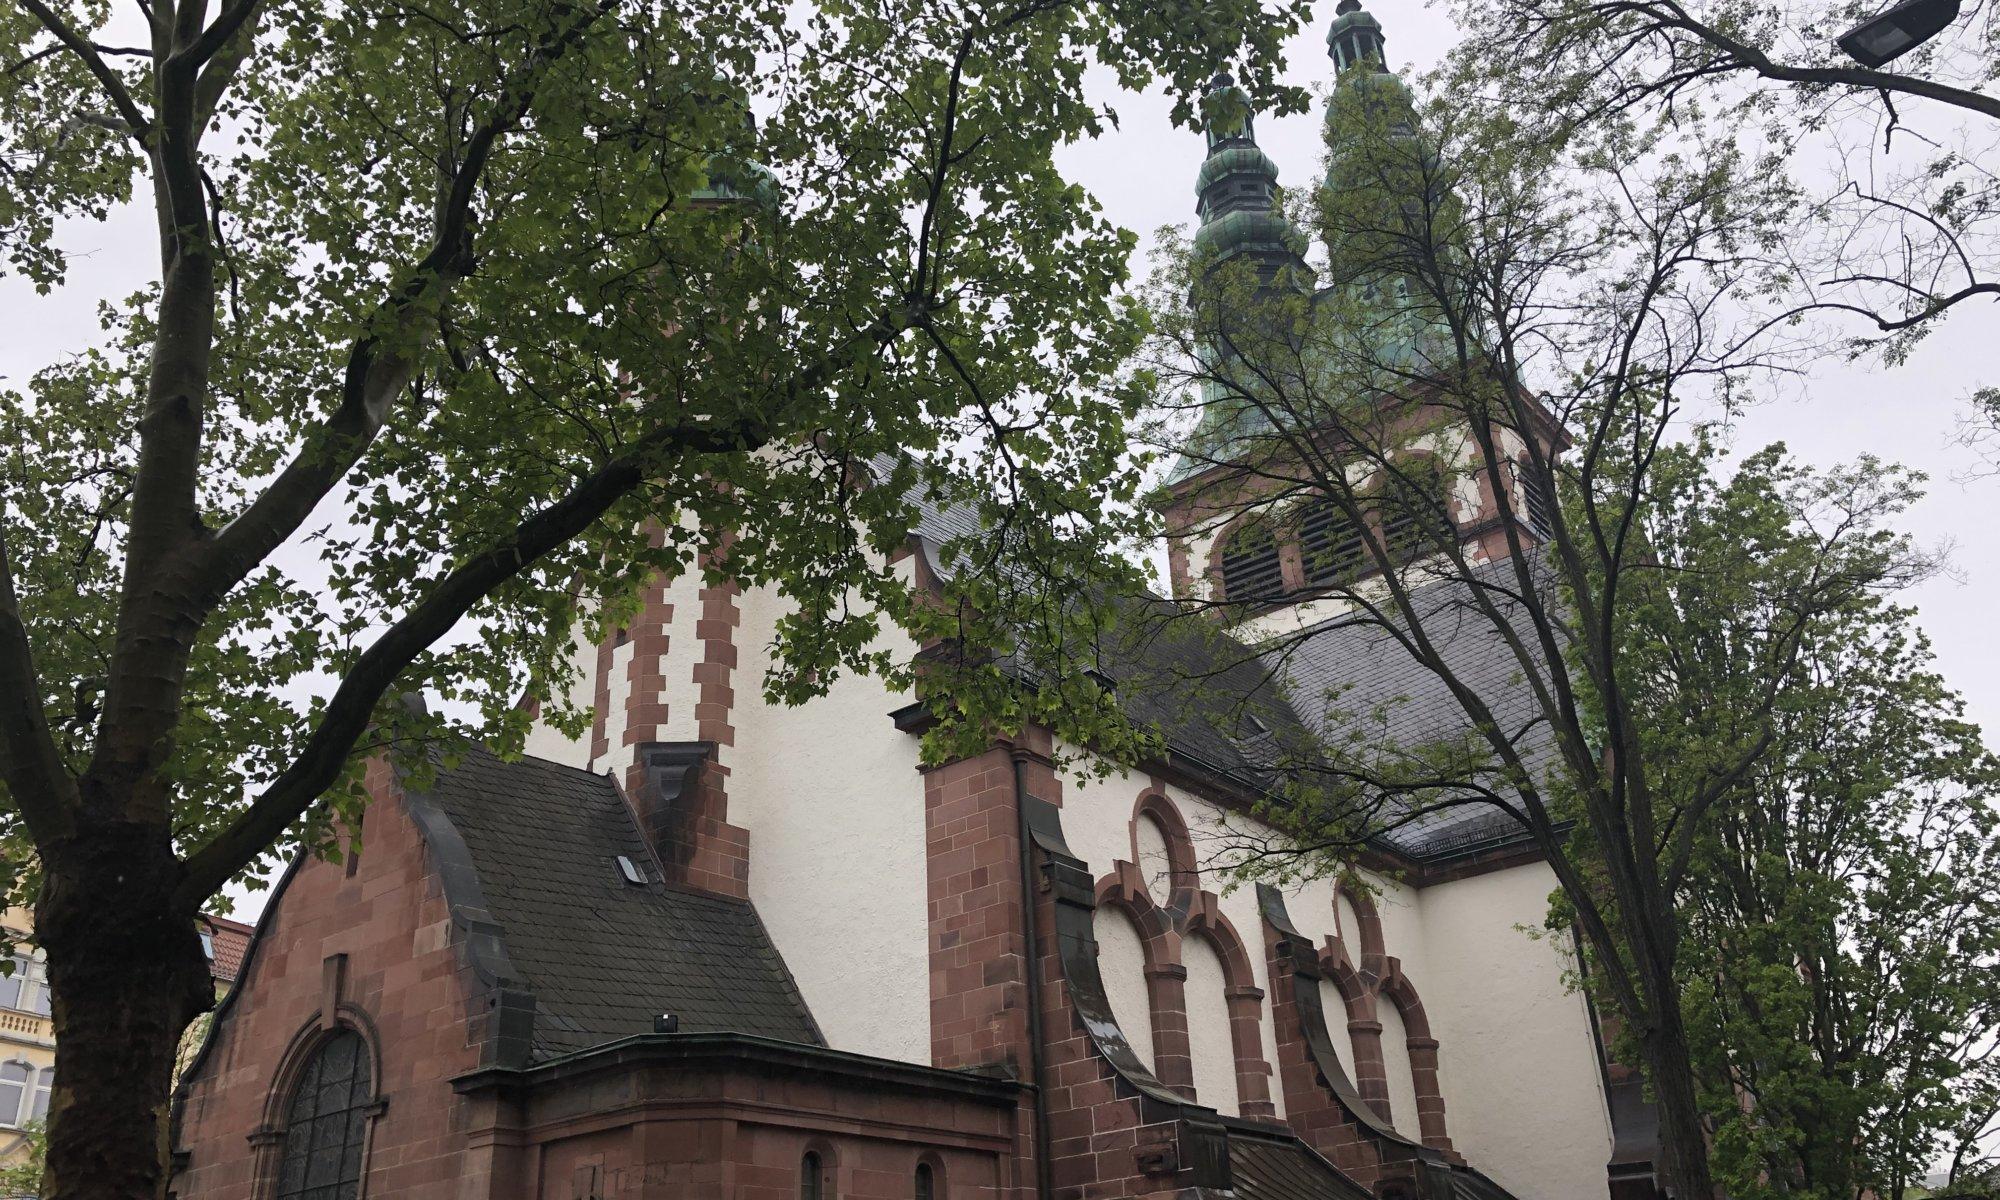 Friedenskirche, Kassel